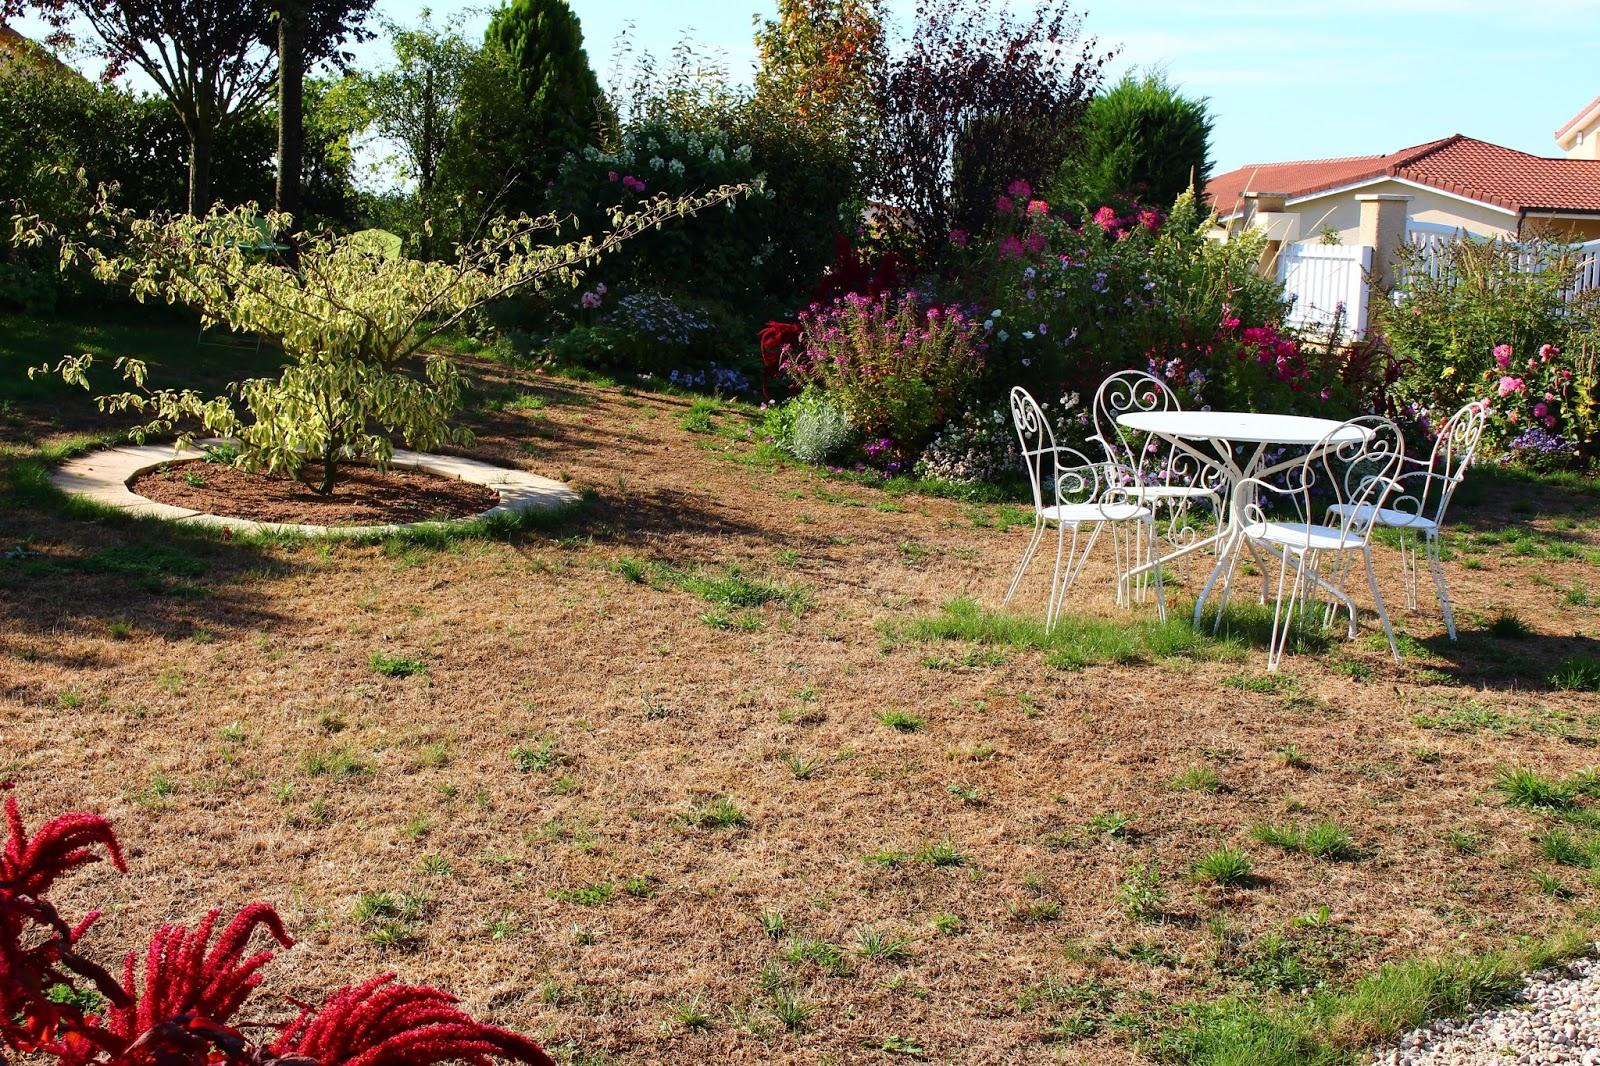 Roses Du Jardin Cheneland 09 01 2015 10 01 2015